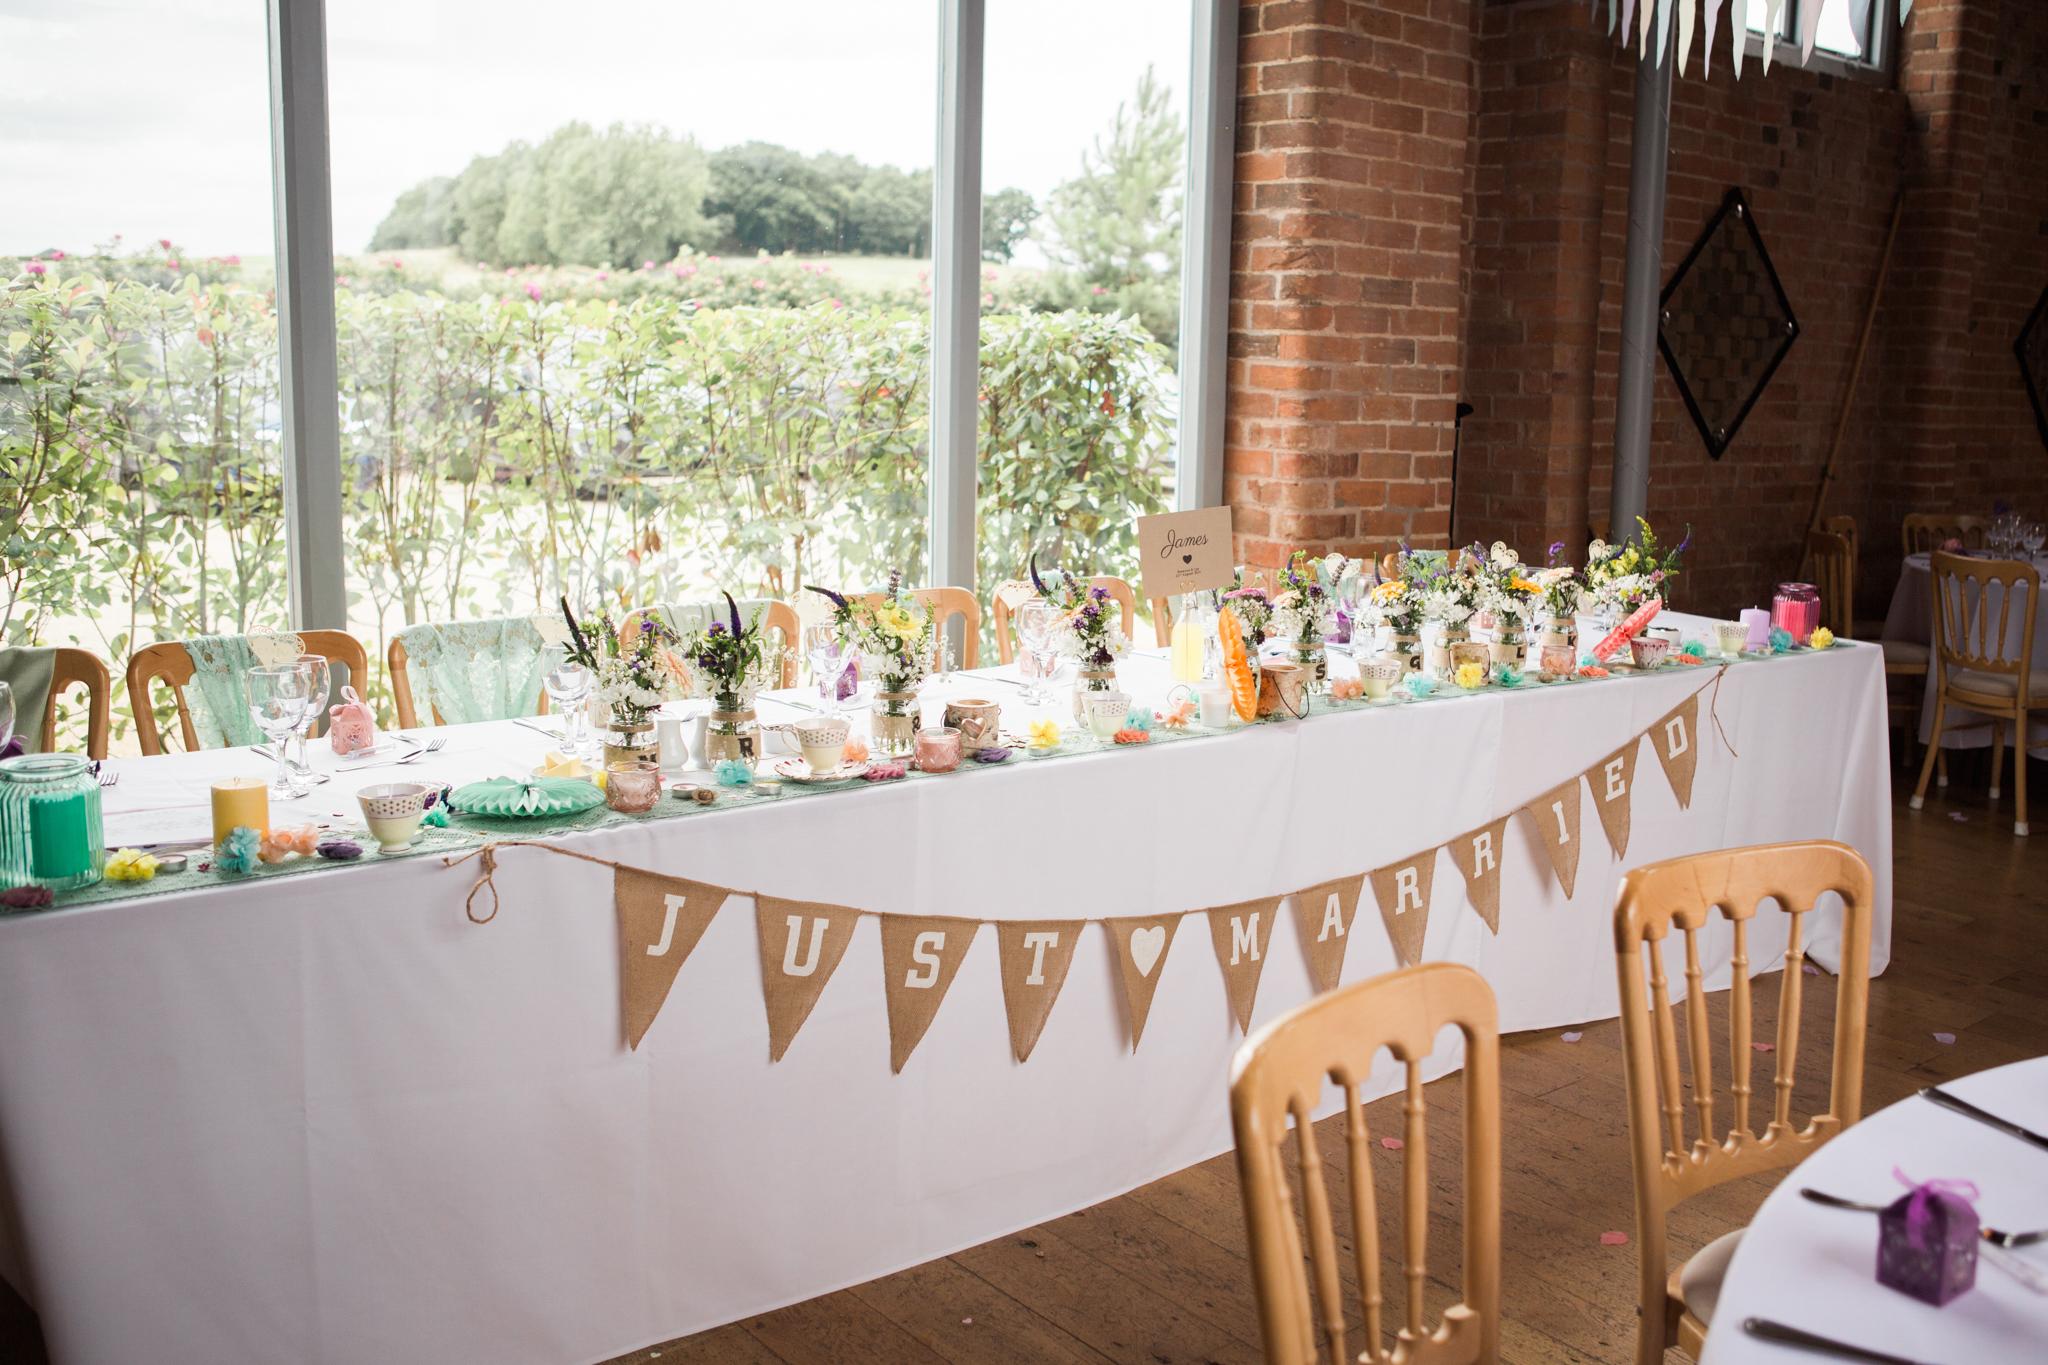 Rowsie & Lee, Swallows Nest Barn Wedding, Cotswold wedding photographer, Warwickshire Wedding Photographer-105.jpg